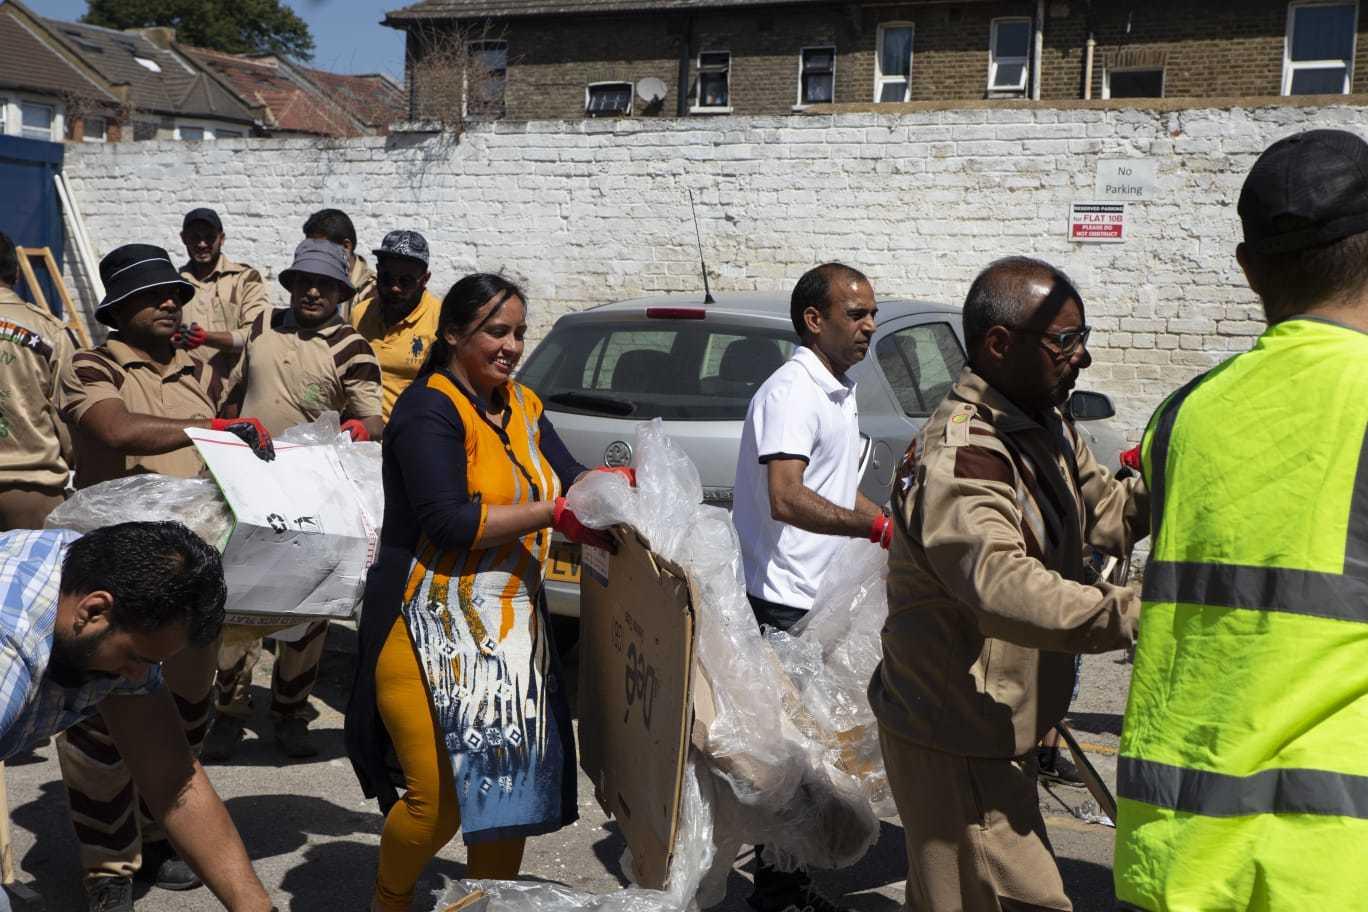 38th Cleanliness Drive by Dera Sacha Sauda Volunteers in London, UK